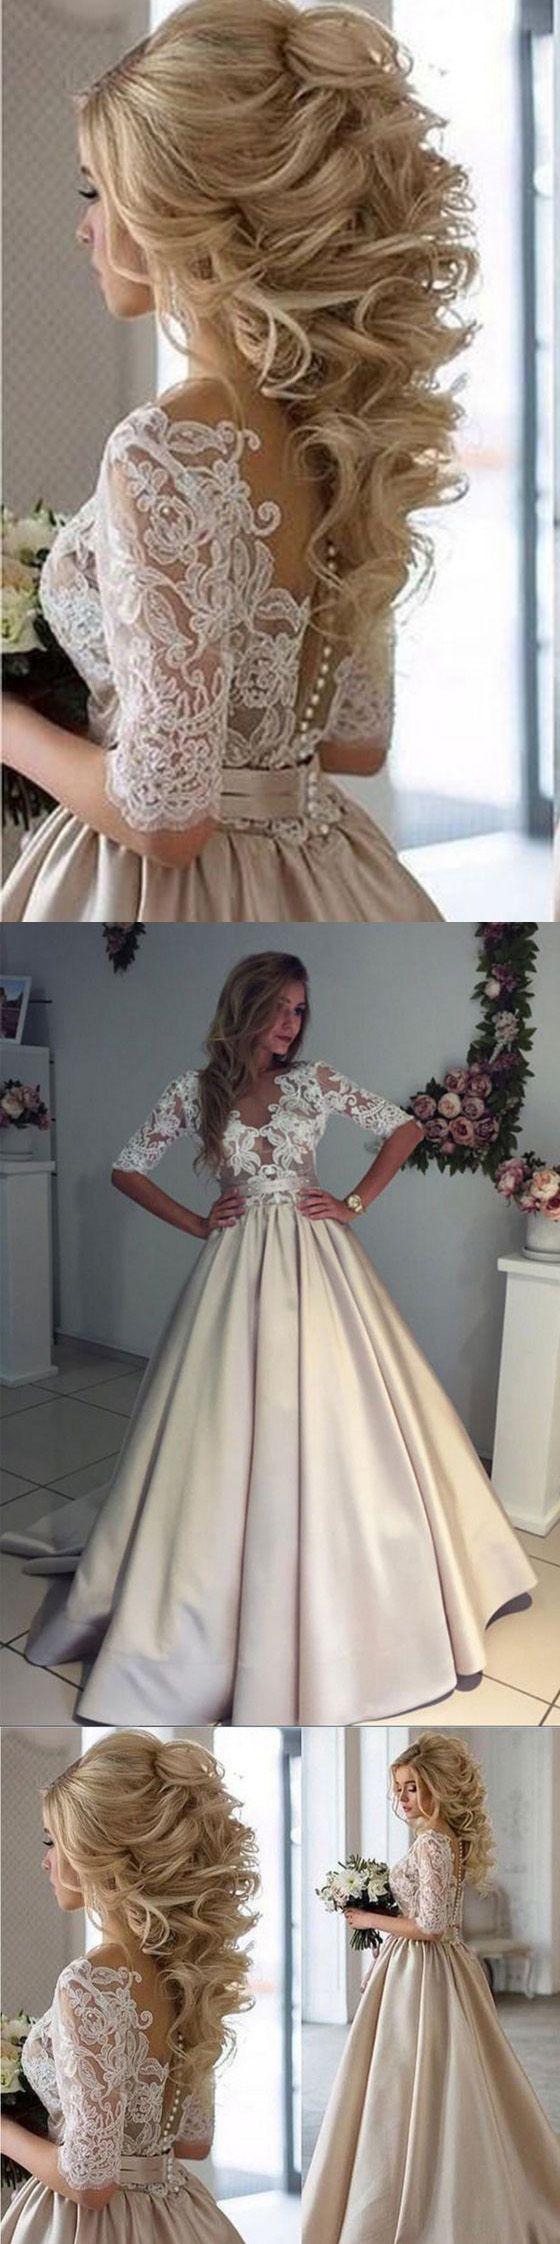 Half Sleeves Lace Top Satin Eleagnt Bridal Long Wedding Dresses, WG1244 #weddingdress #longweddingdress